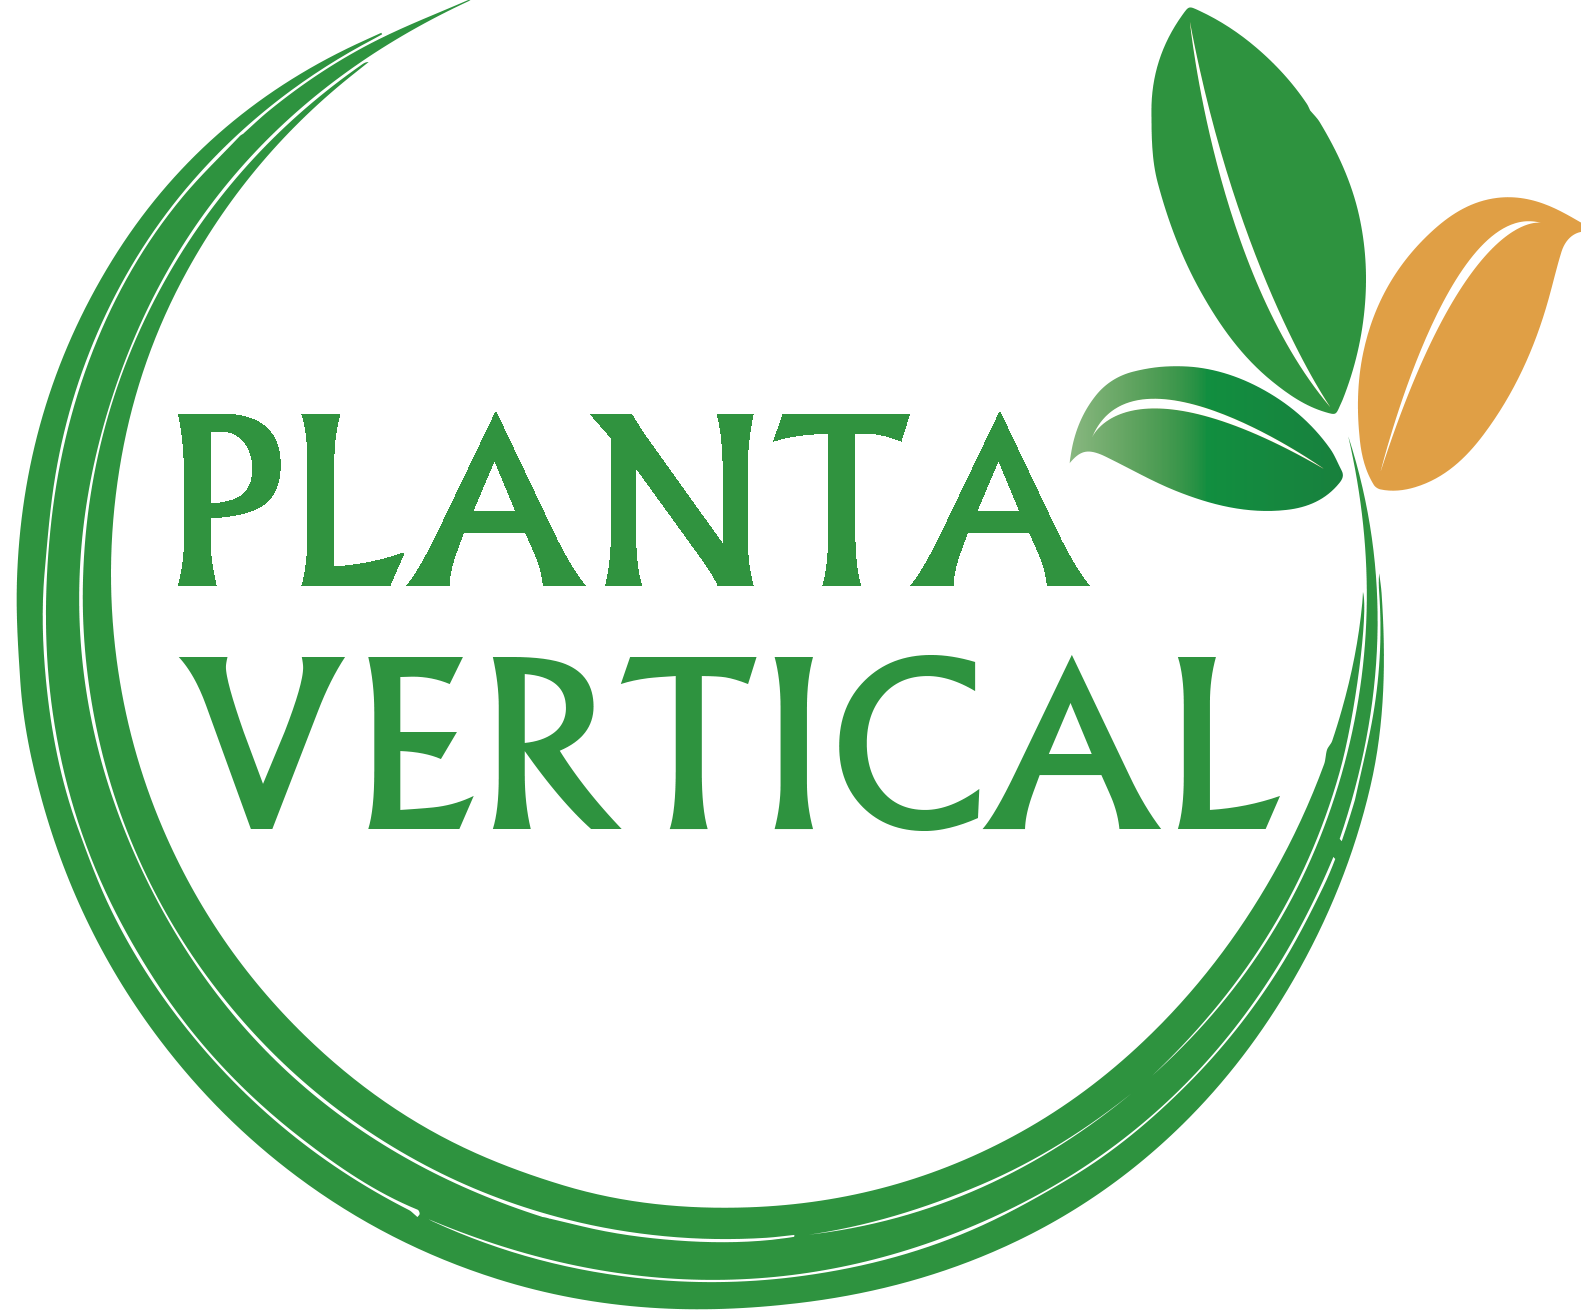 PLANTA VERTICAL